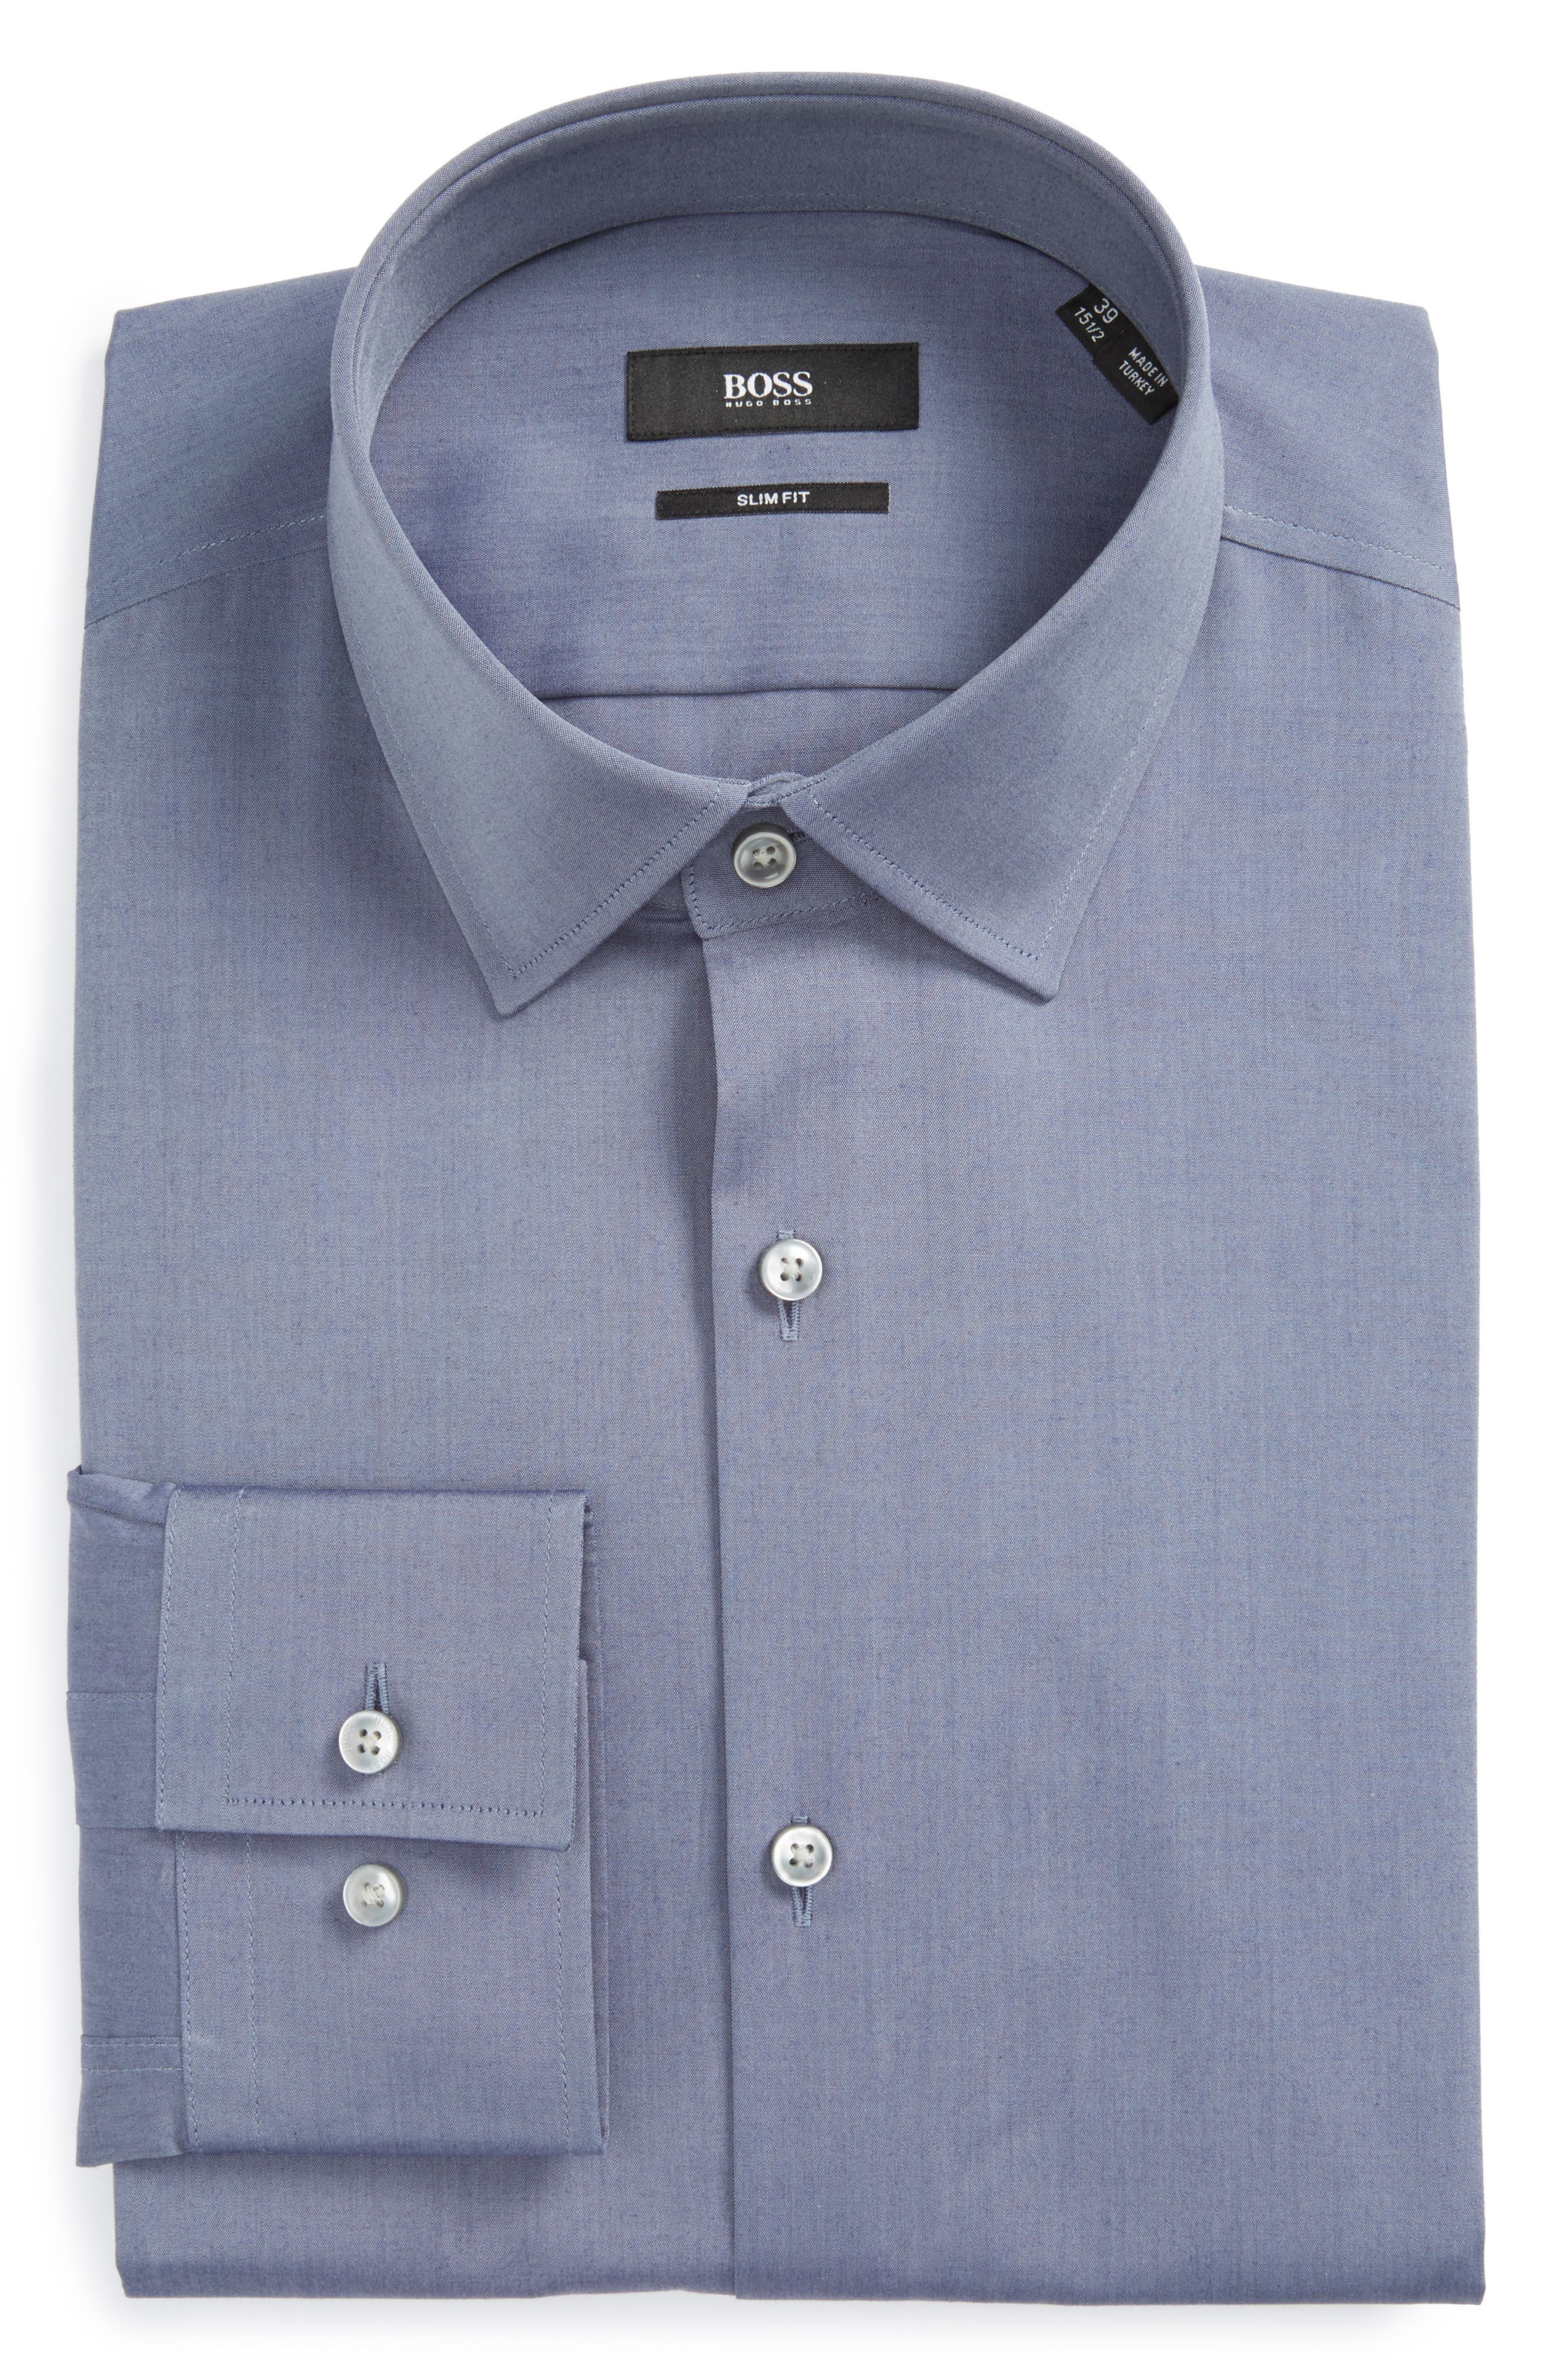 Main Image - BOSS Jenno Slim Fit Solid Dress Shirt